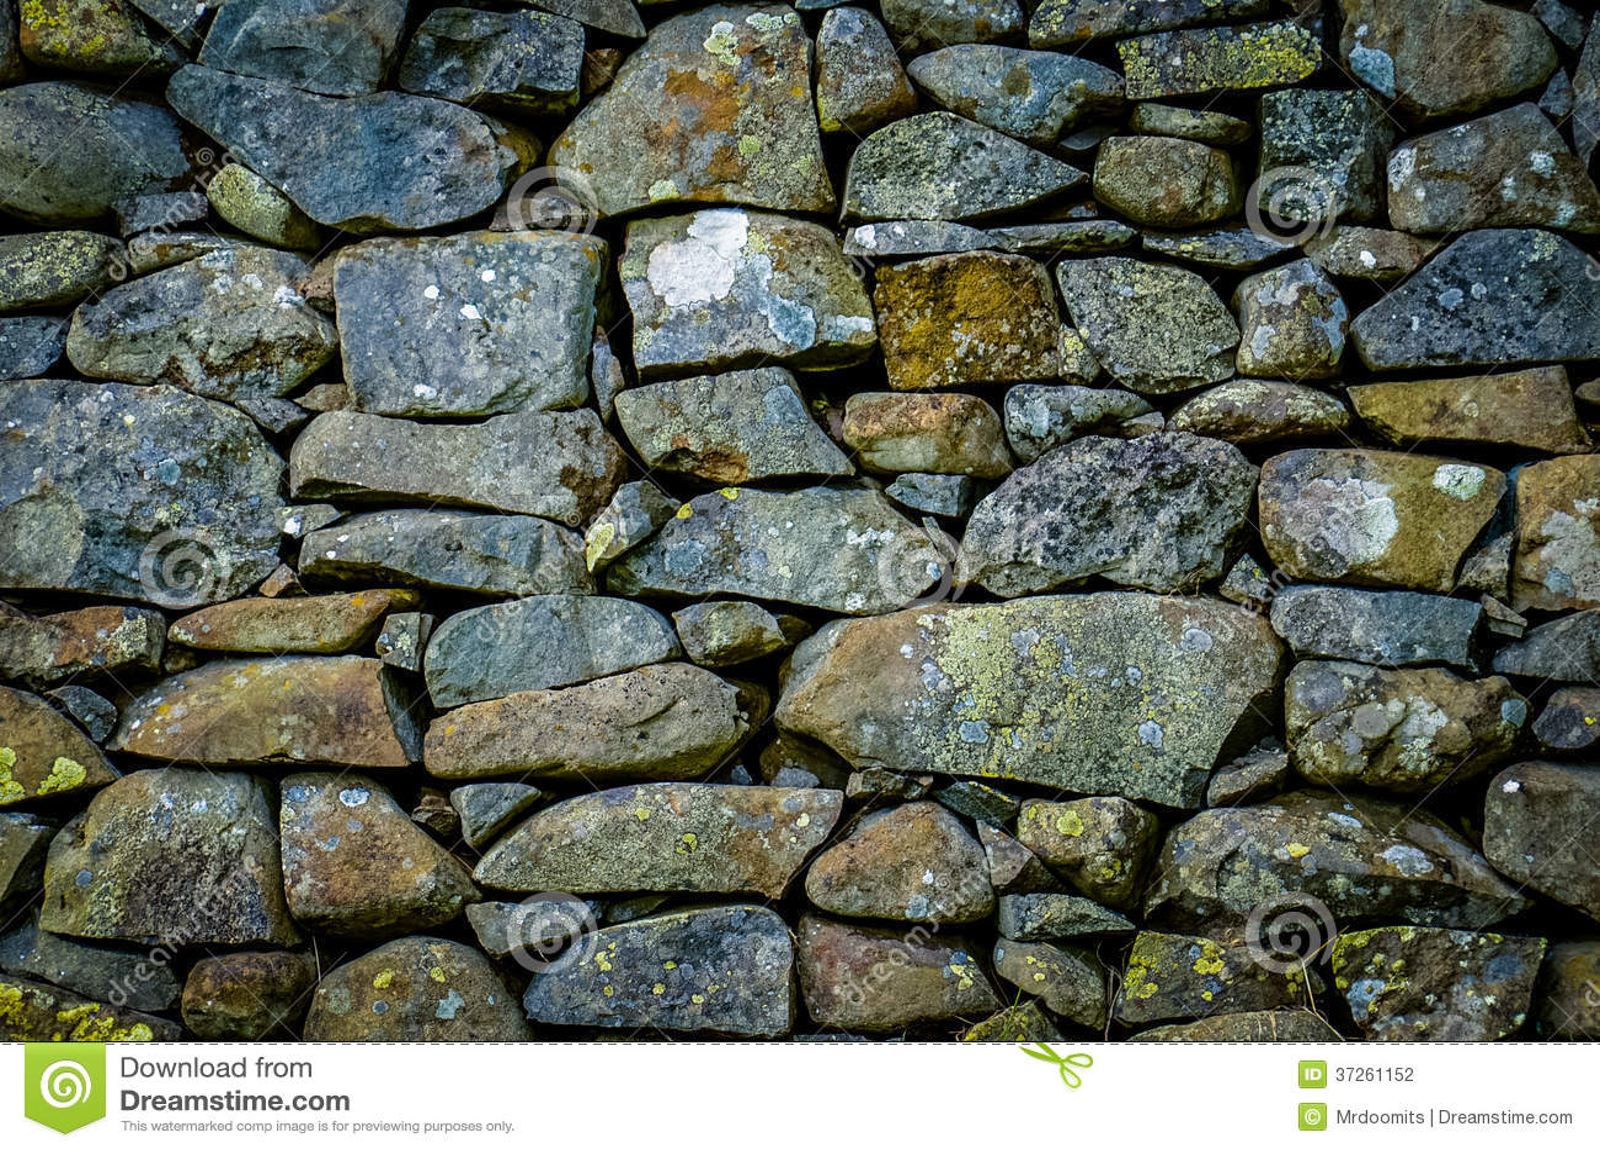 Rustic Stone Walls : Rustic stone wall royalty free stock image cartoondealer